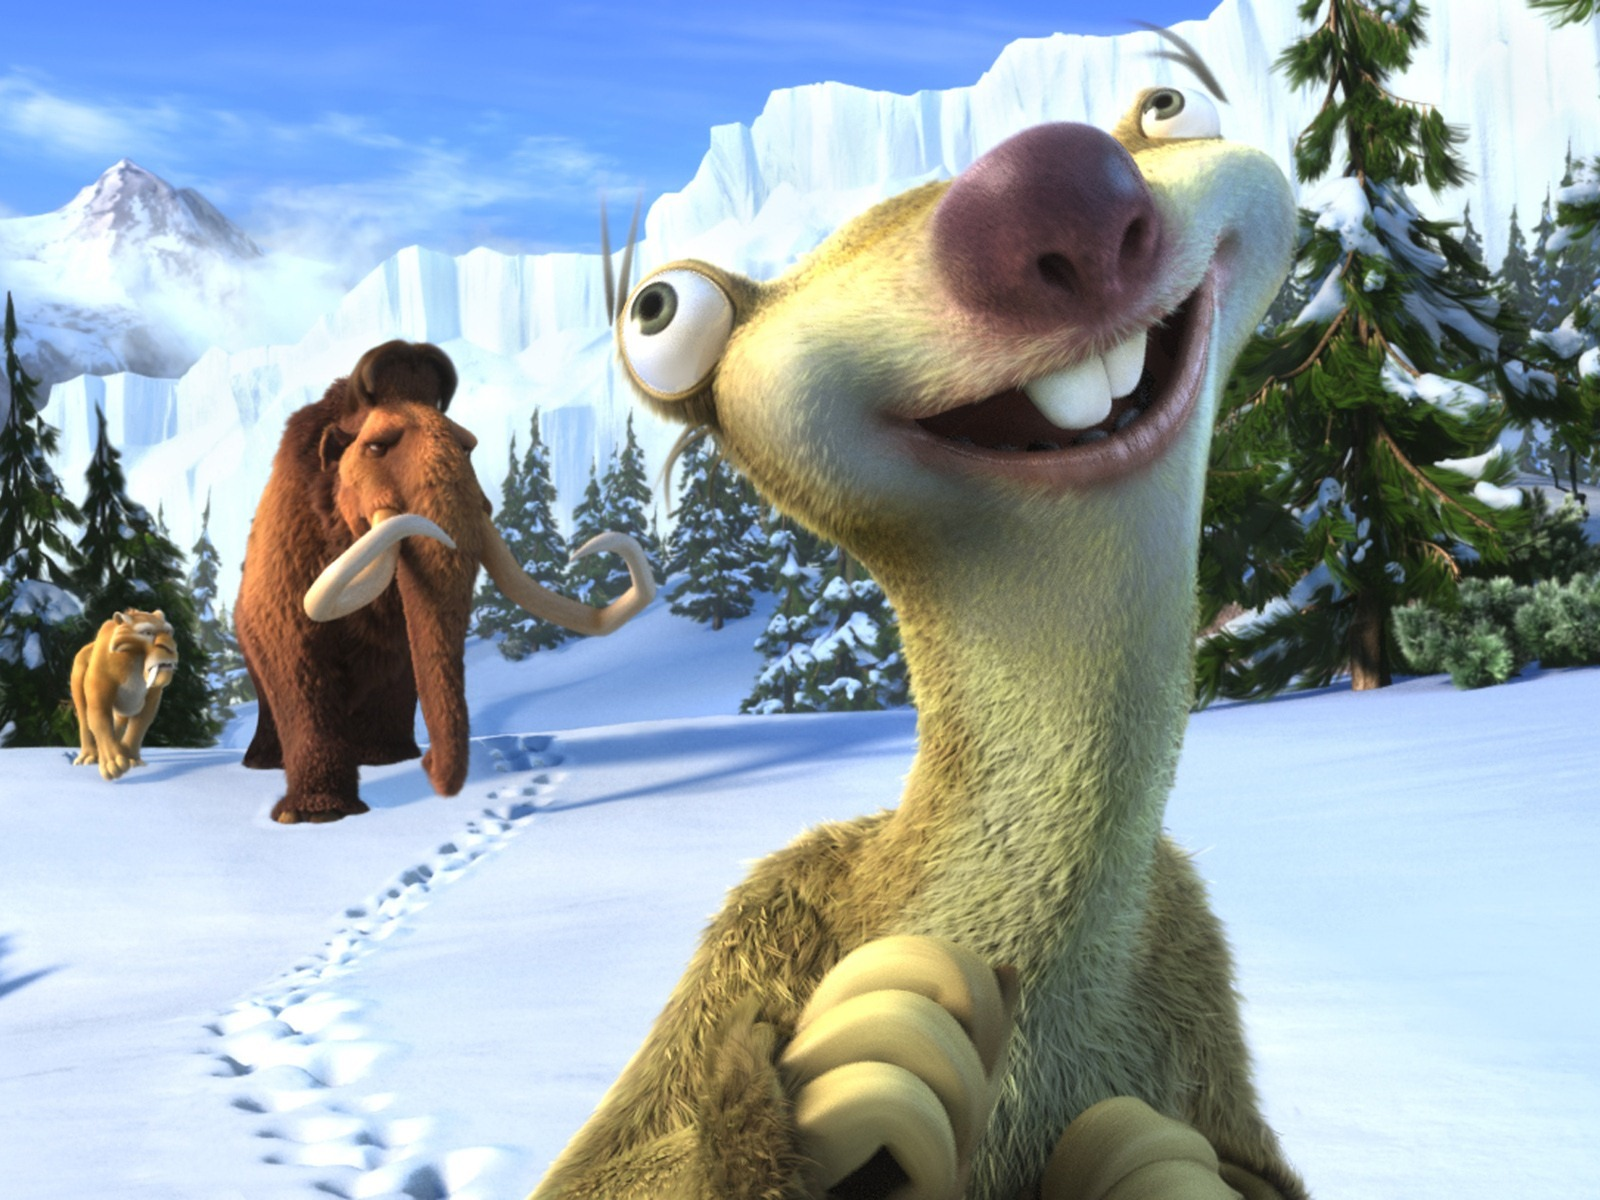 Ice Age 14263 1600x1200 px